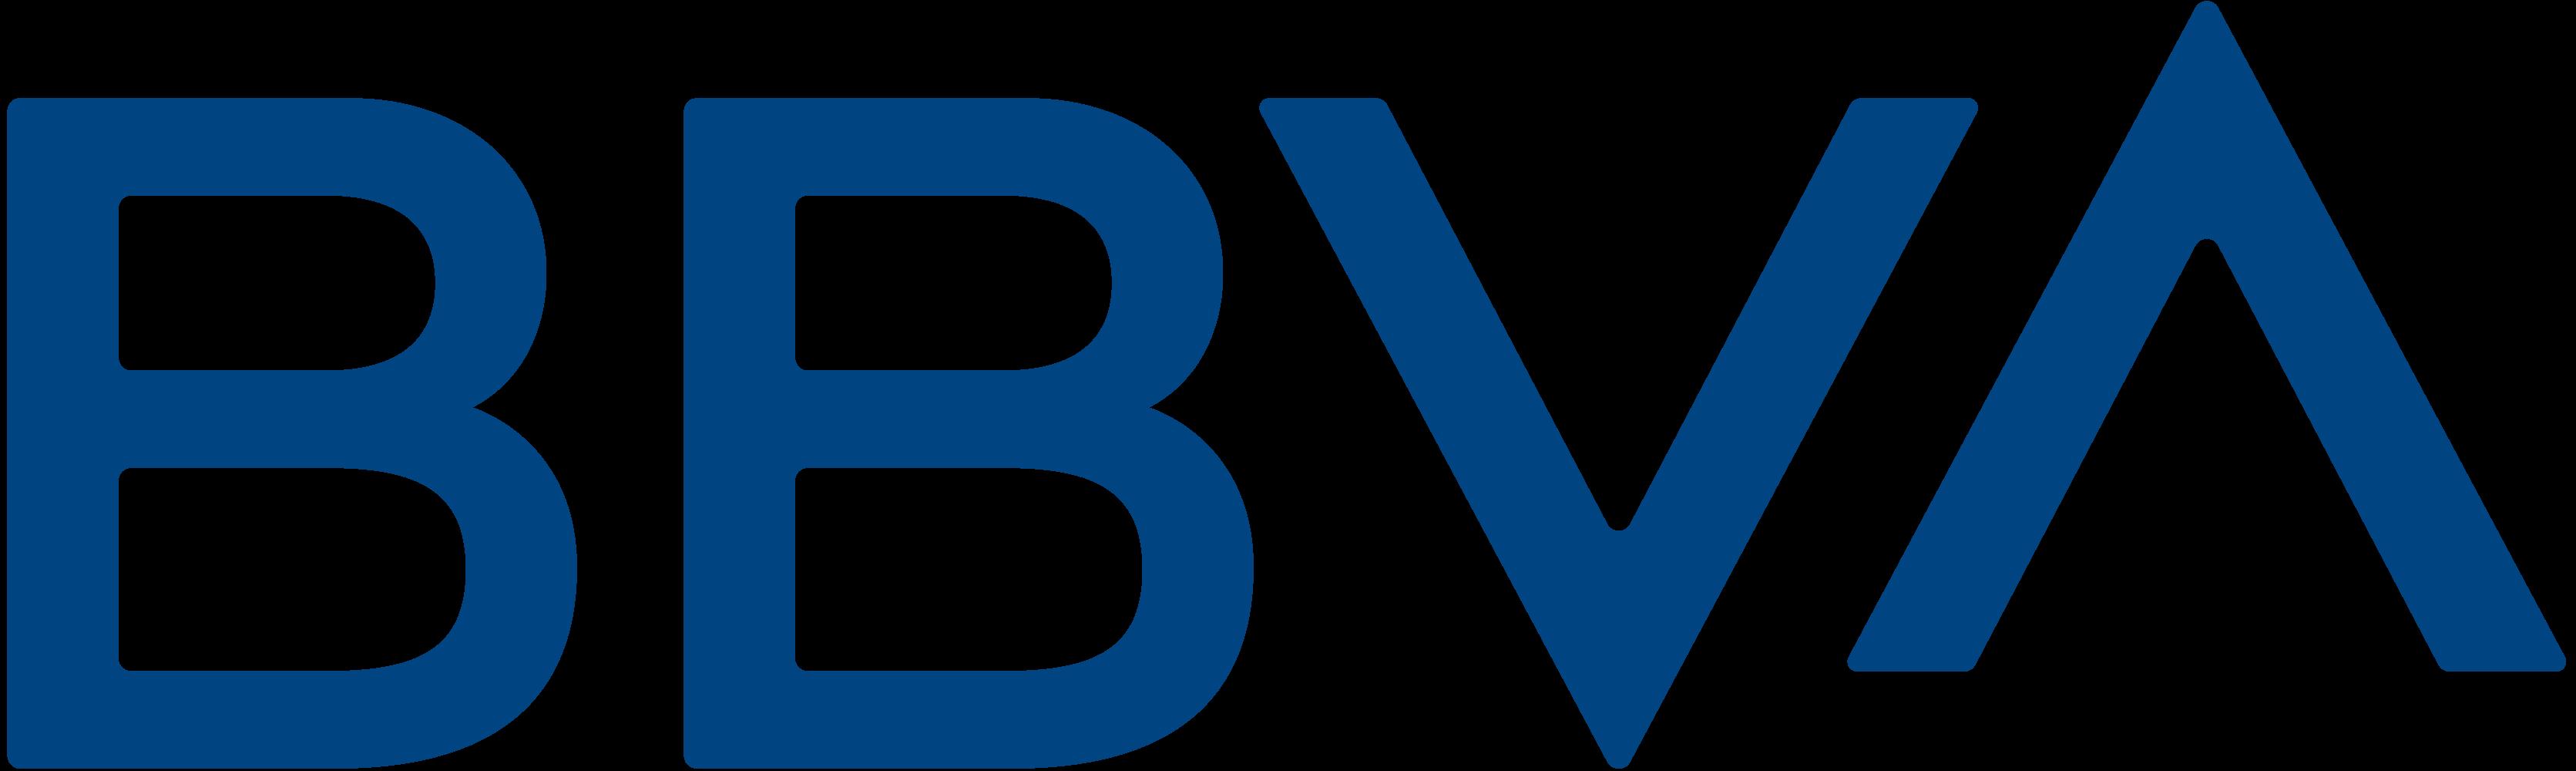 BBVA Company Logo - MoneyLIVE